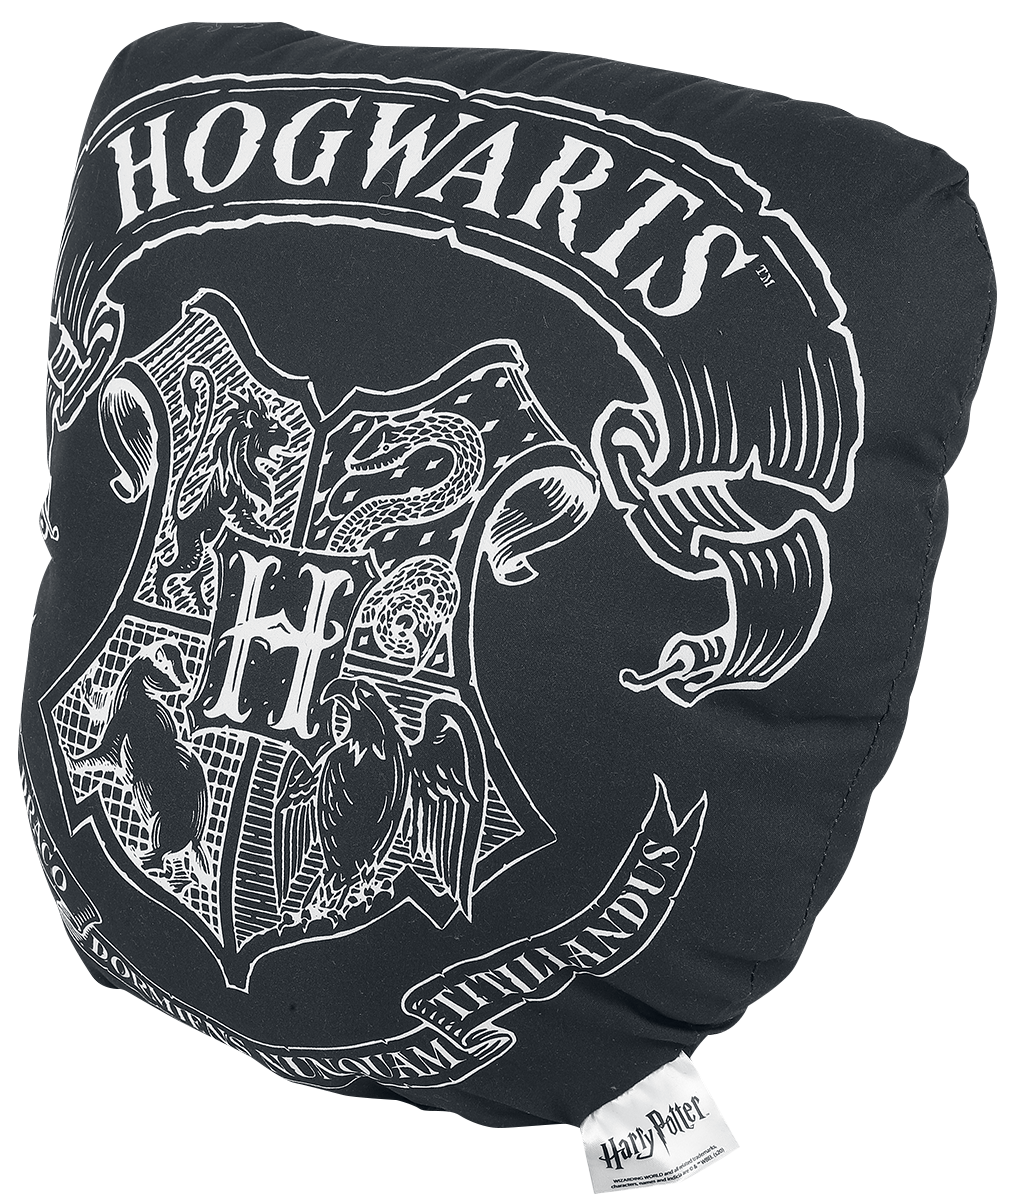 Harry Potter - Hogwarts - Kissen - schwarz